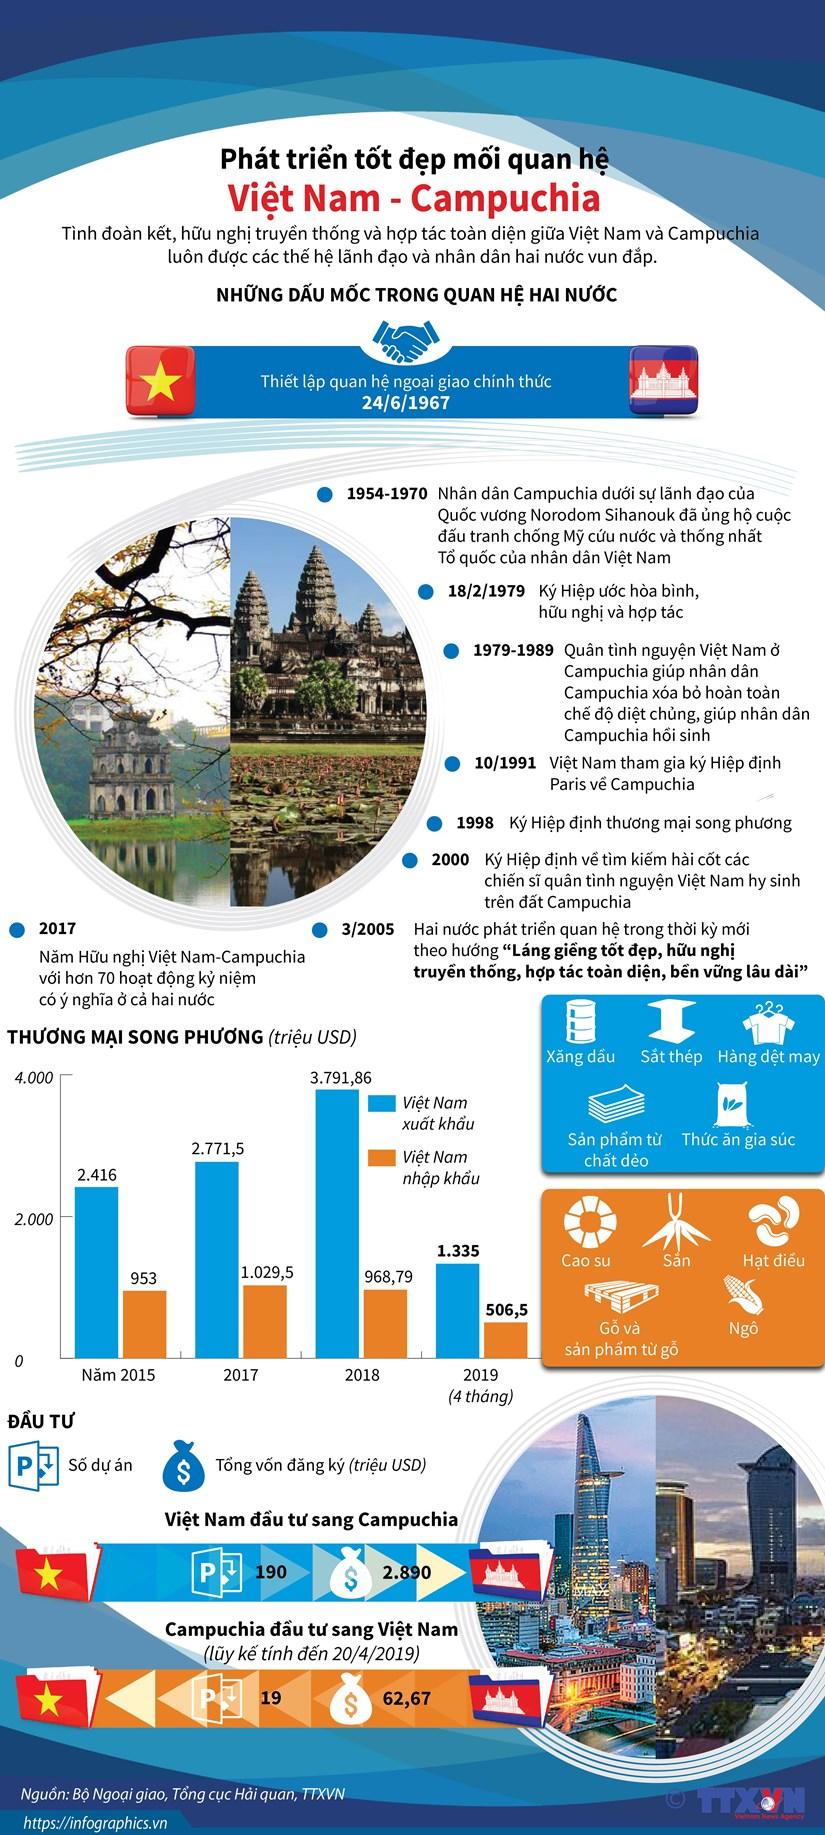 [Infographics] Phat trien tot dep moi quan he Viet Nam-Campuchia hinh anh 1